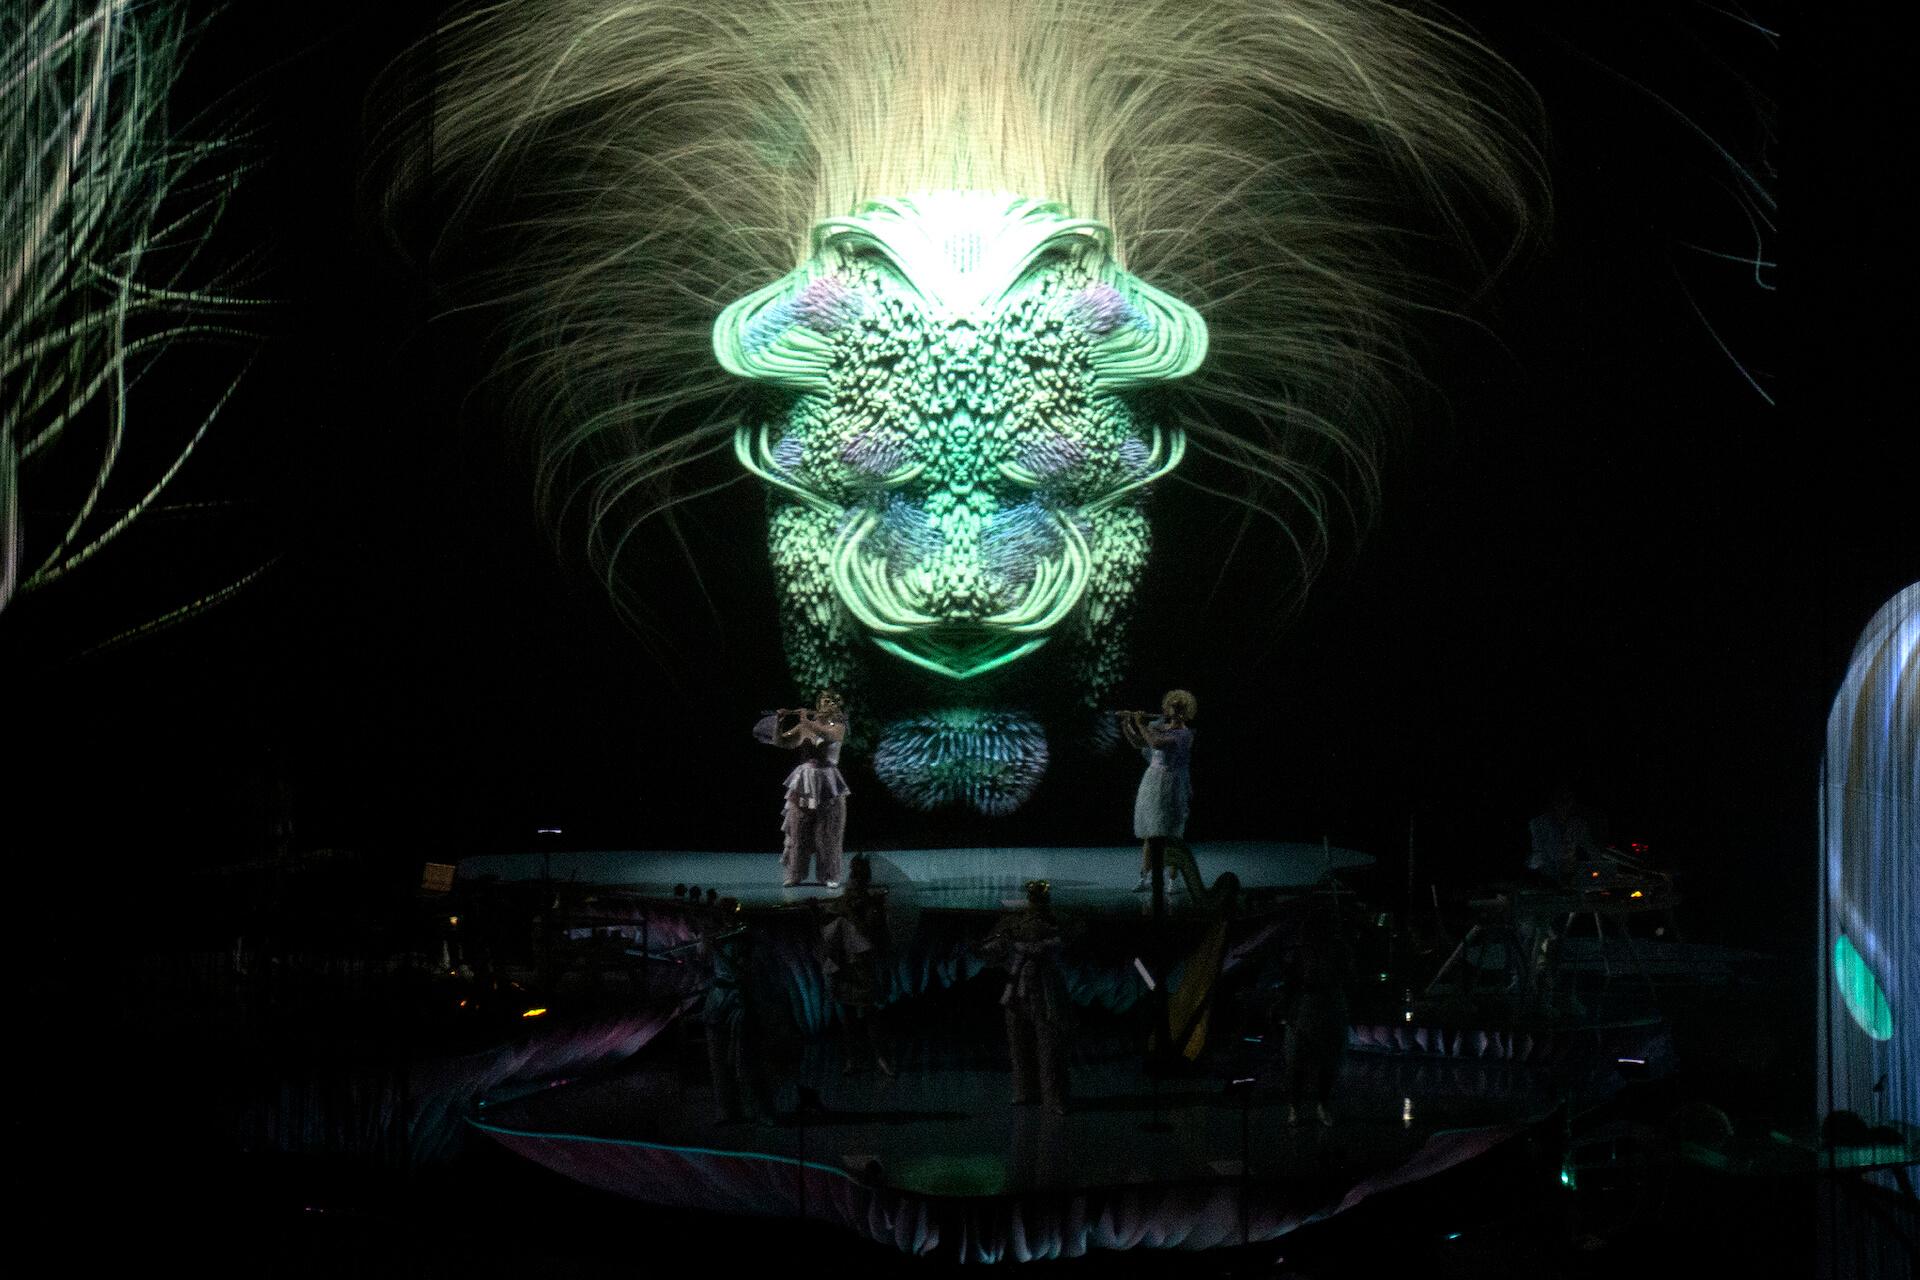 Björk's Cornucopia. Santiago Felipe, 2019. Courtesy One Little Indian/The Shed